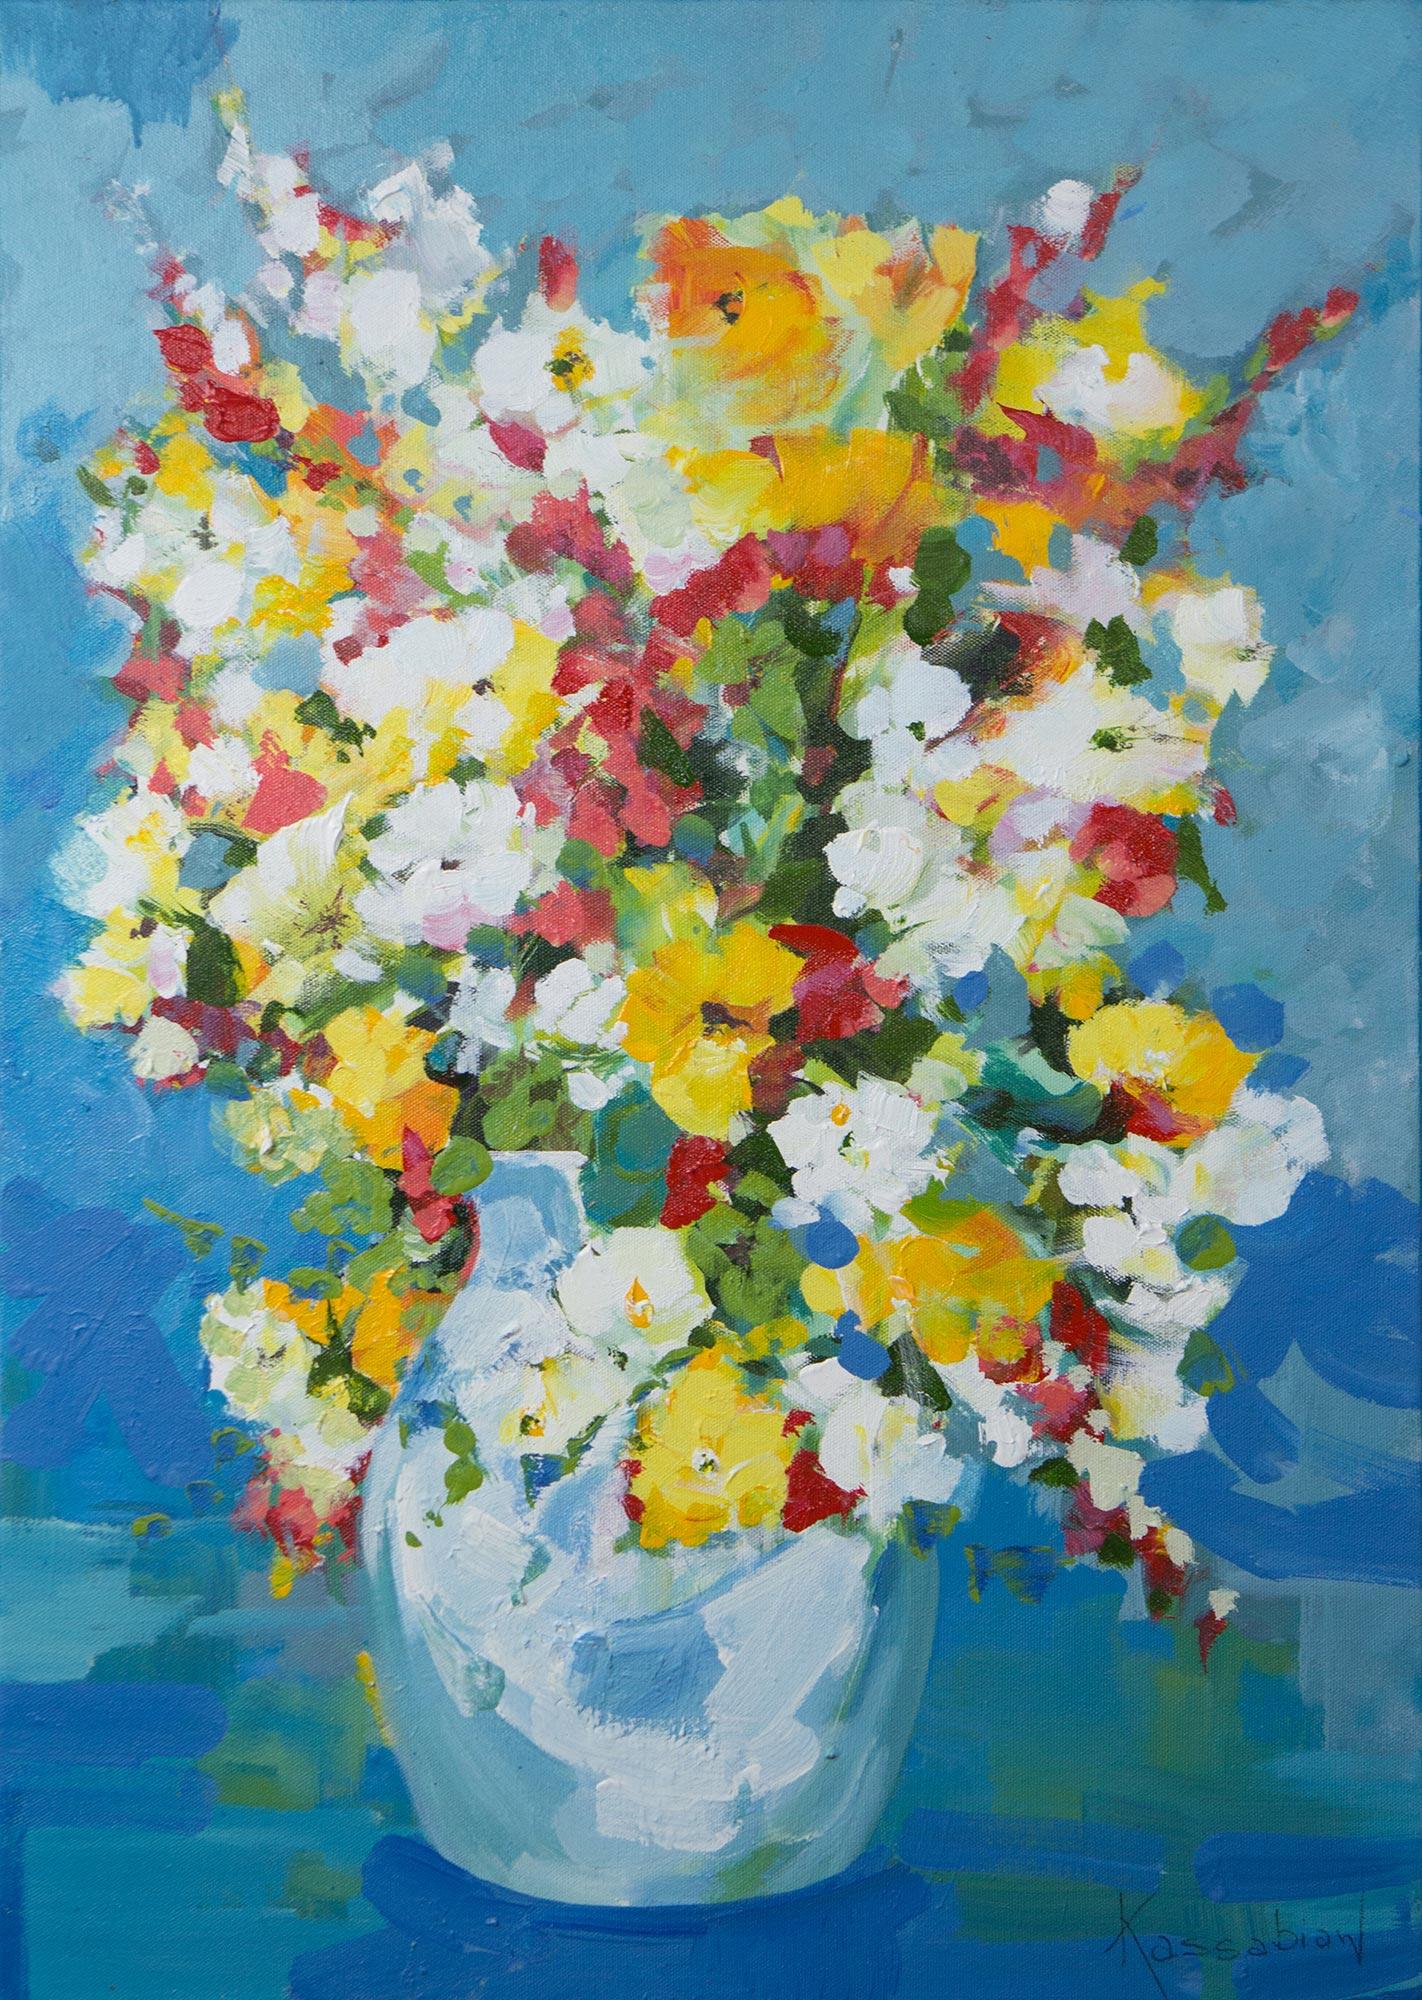 Still Life Painting of a Colorful Flower Vase from Brazil \ Vase of Country Flowers\   sc 1 st  Novica & Still Life Painting of a Colorful Flower Vase from Brazil - Vase of ...